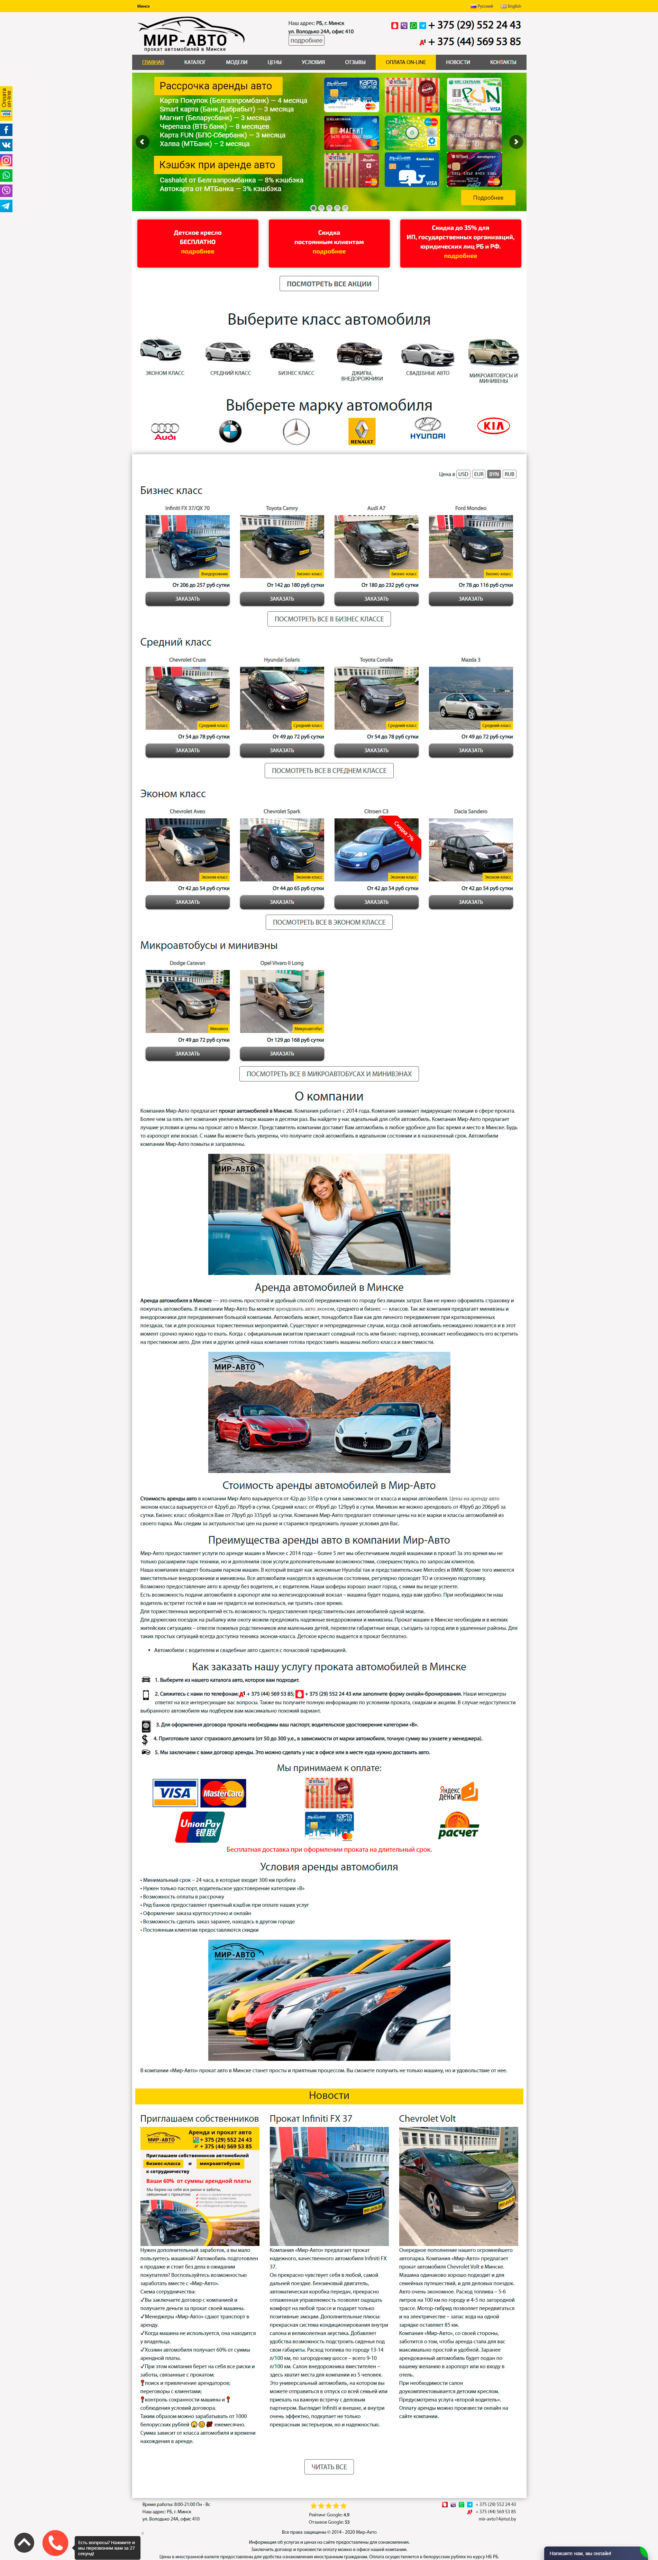 Сайт по аренде авто в Минске mir-avto.by